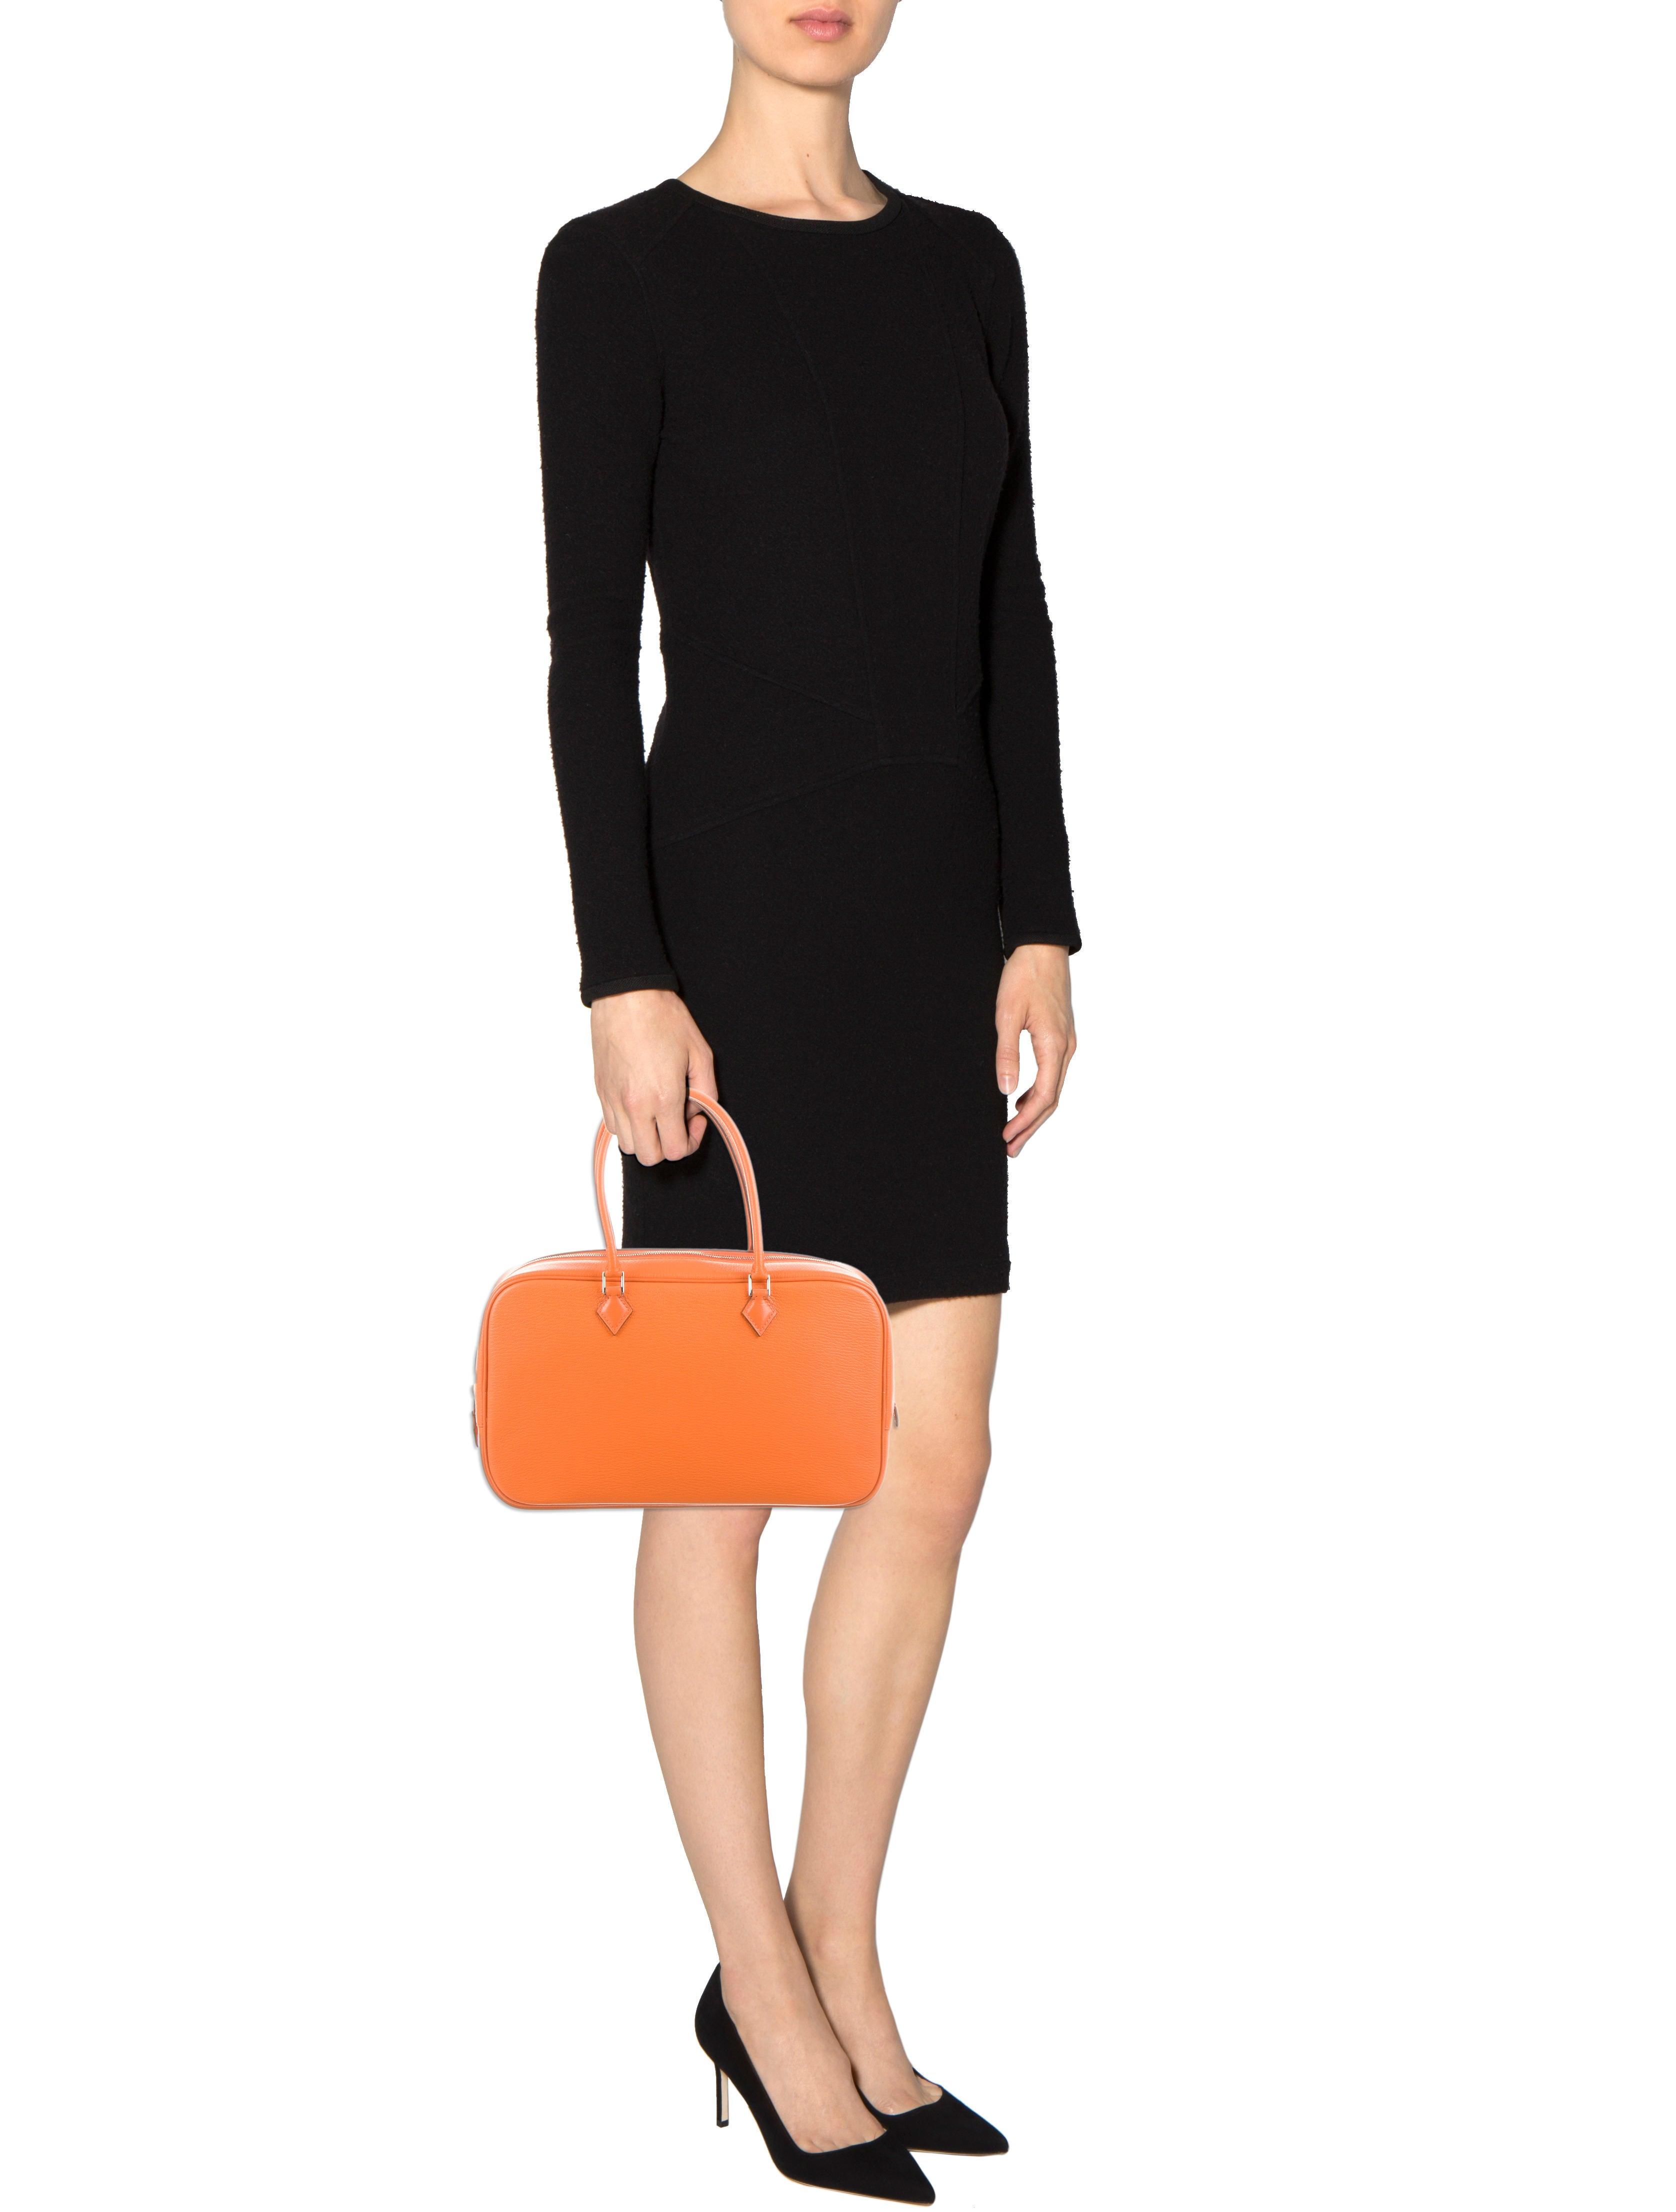 Herm��s Chevre Mysore Plume Elan 28 - Handbags - HER53234 | The ...